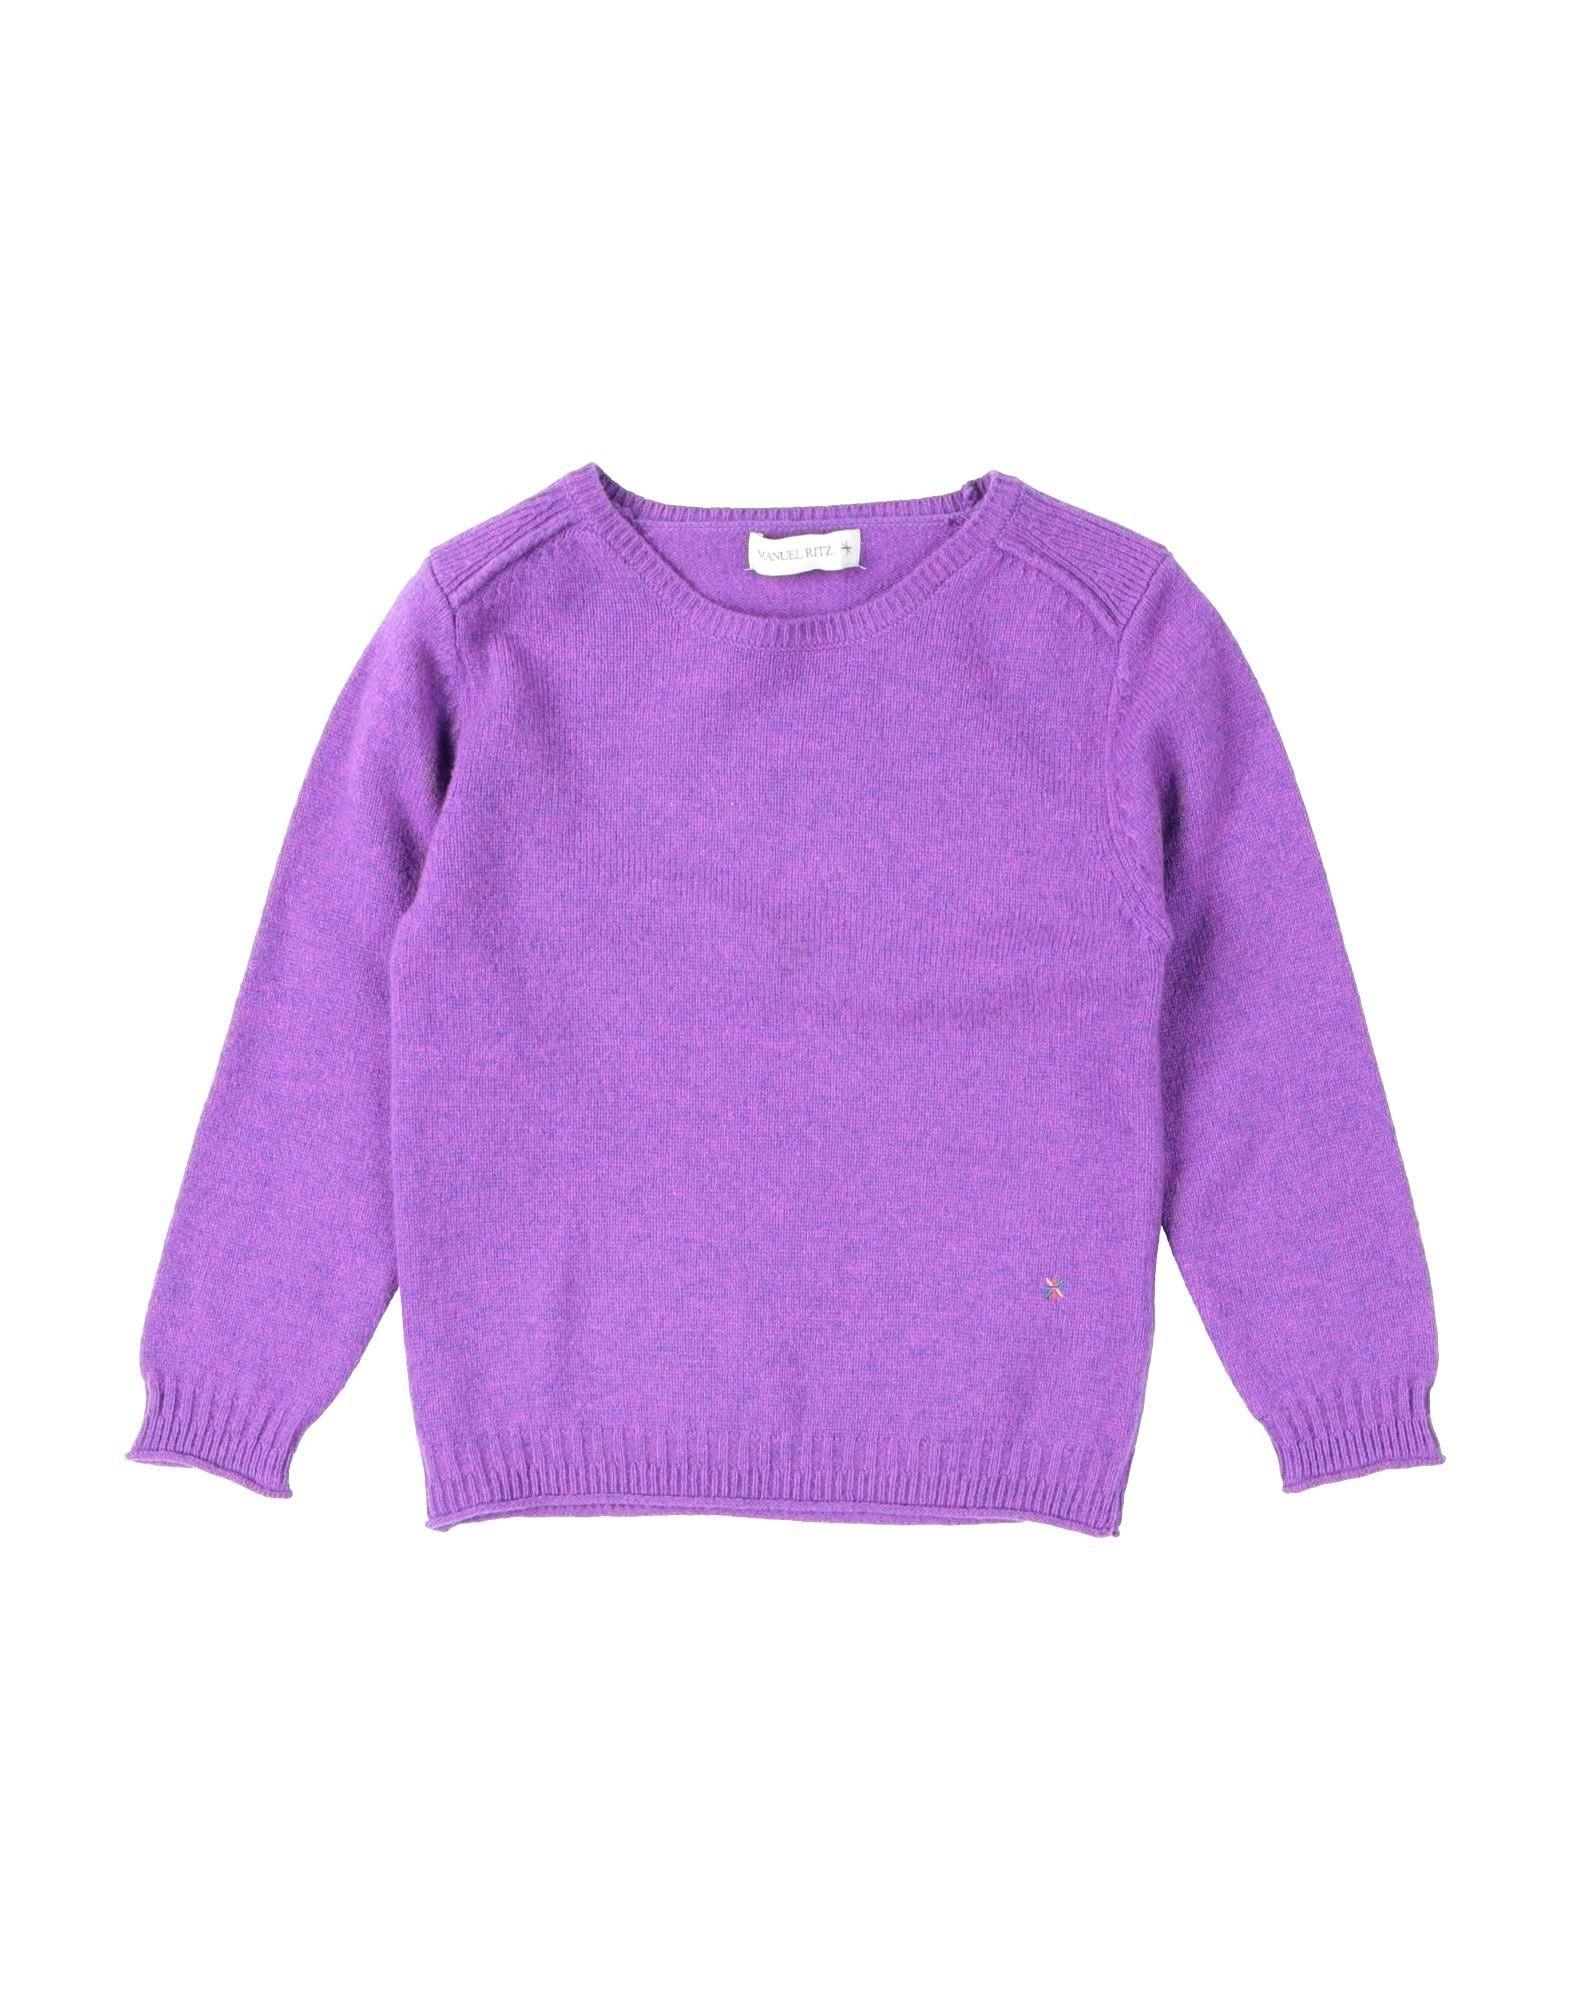 MANUEL RITZ Sweaters - Item 39953233